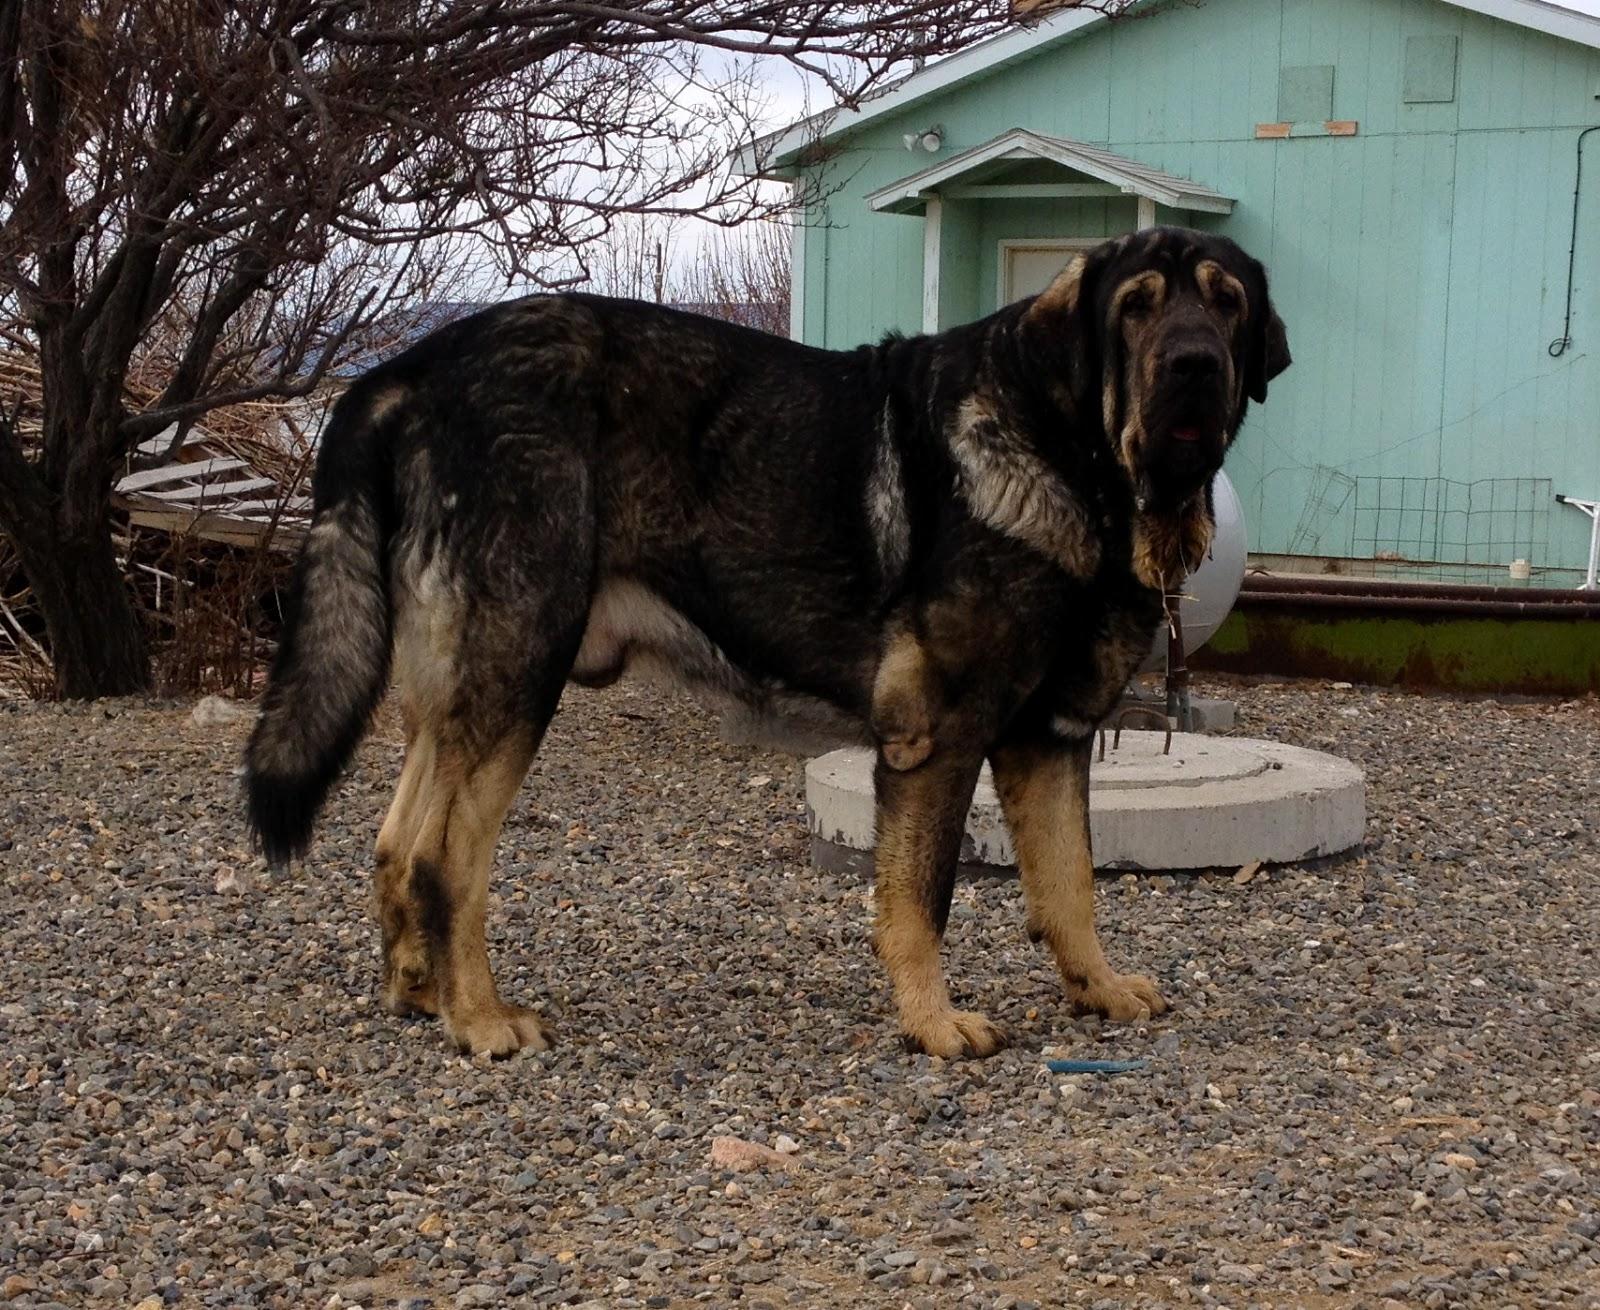 Livestock Guardian Dog Blog by Brenda M. Negri: February 2016